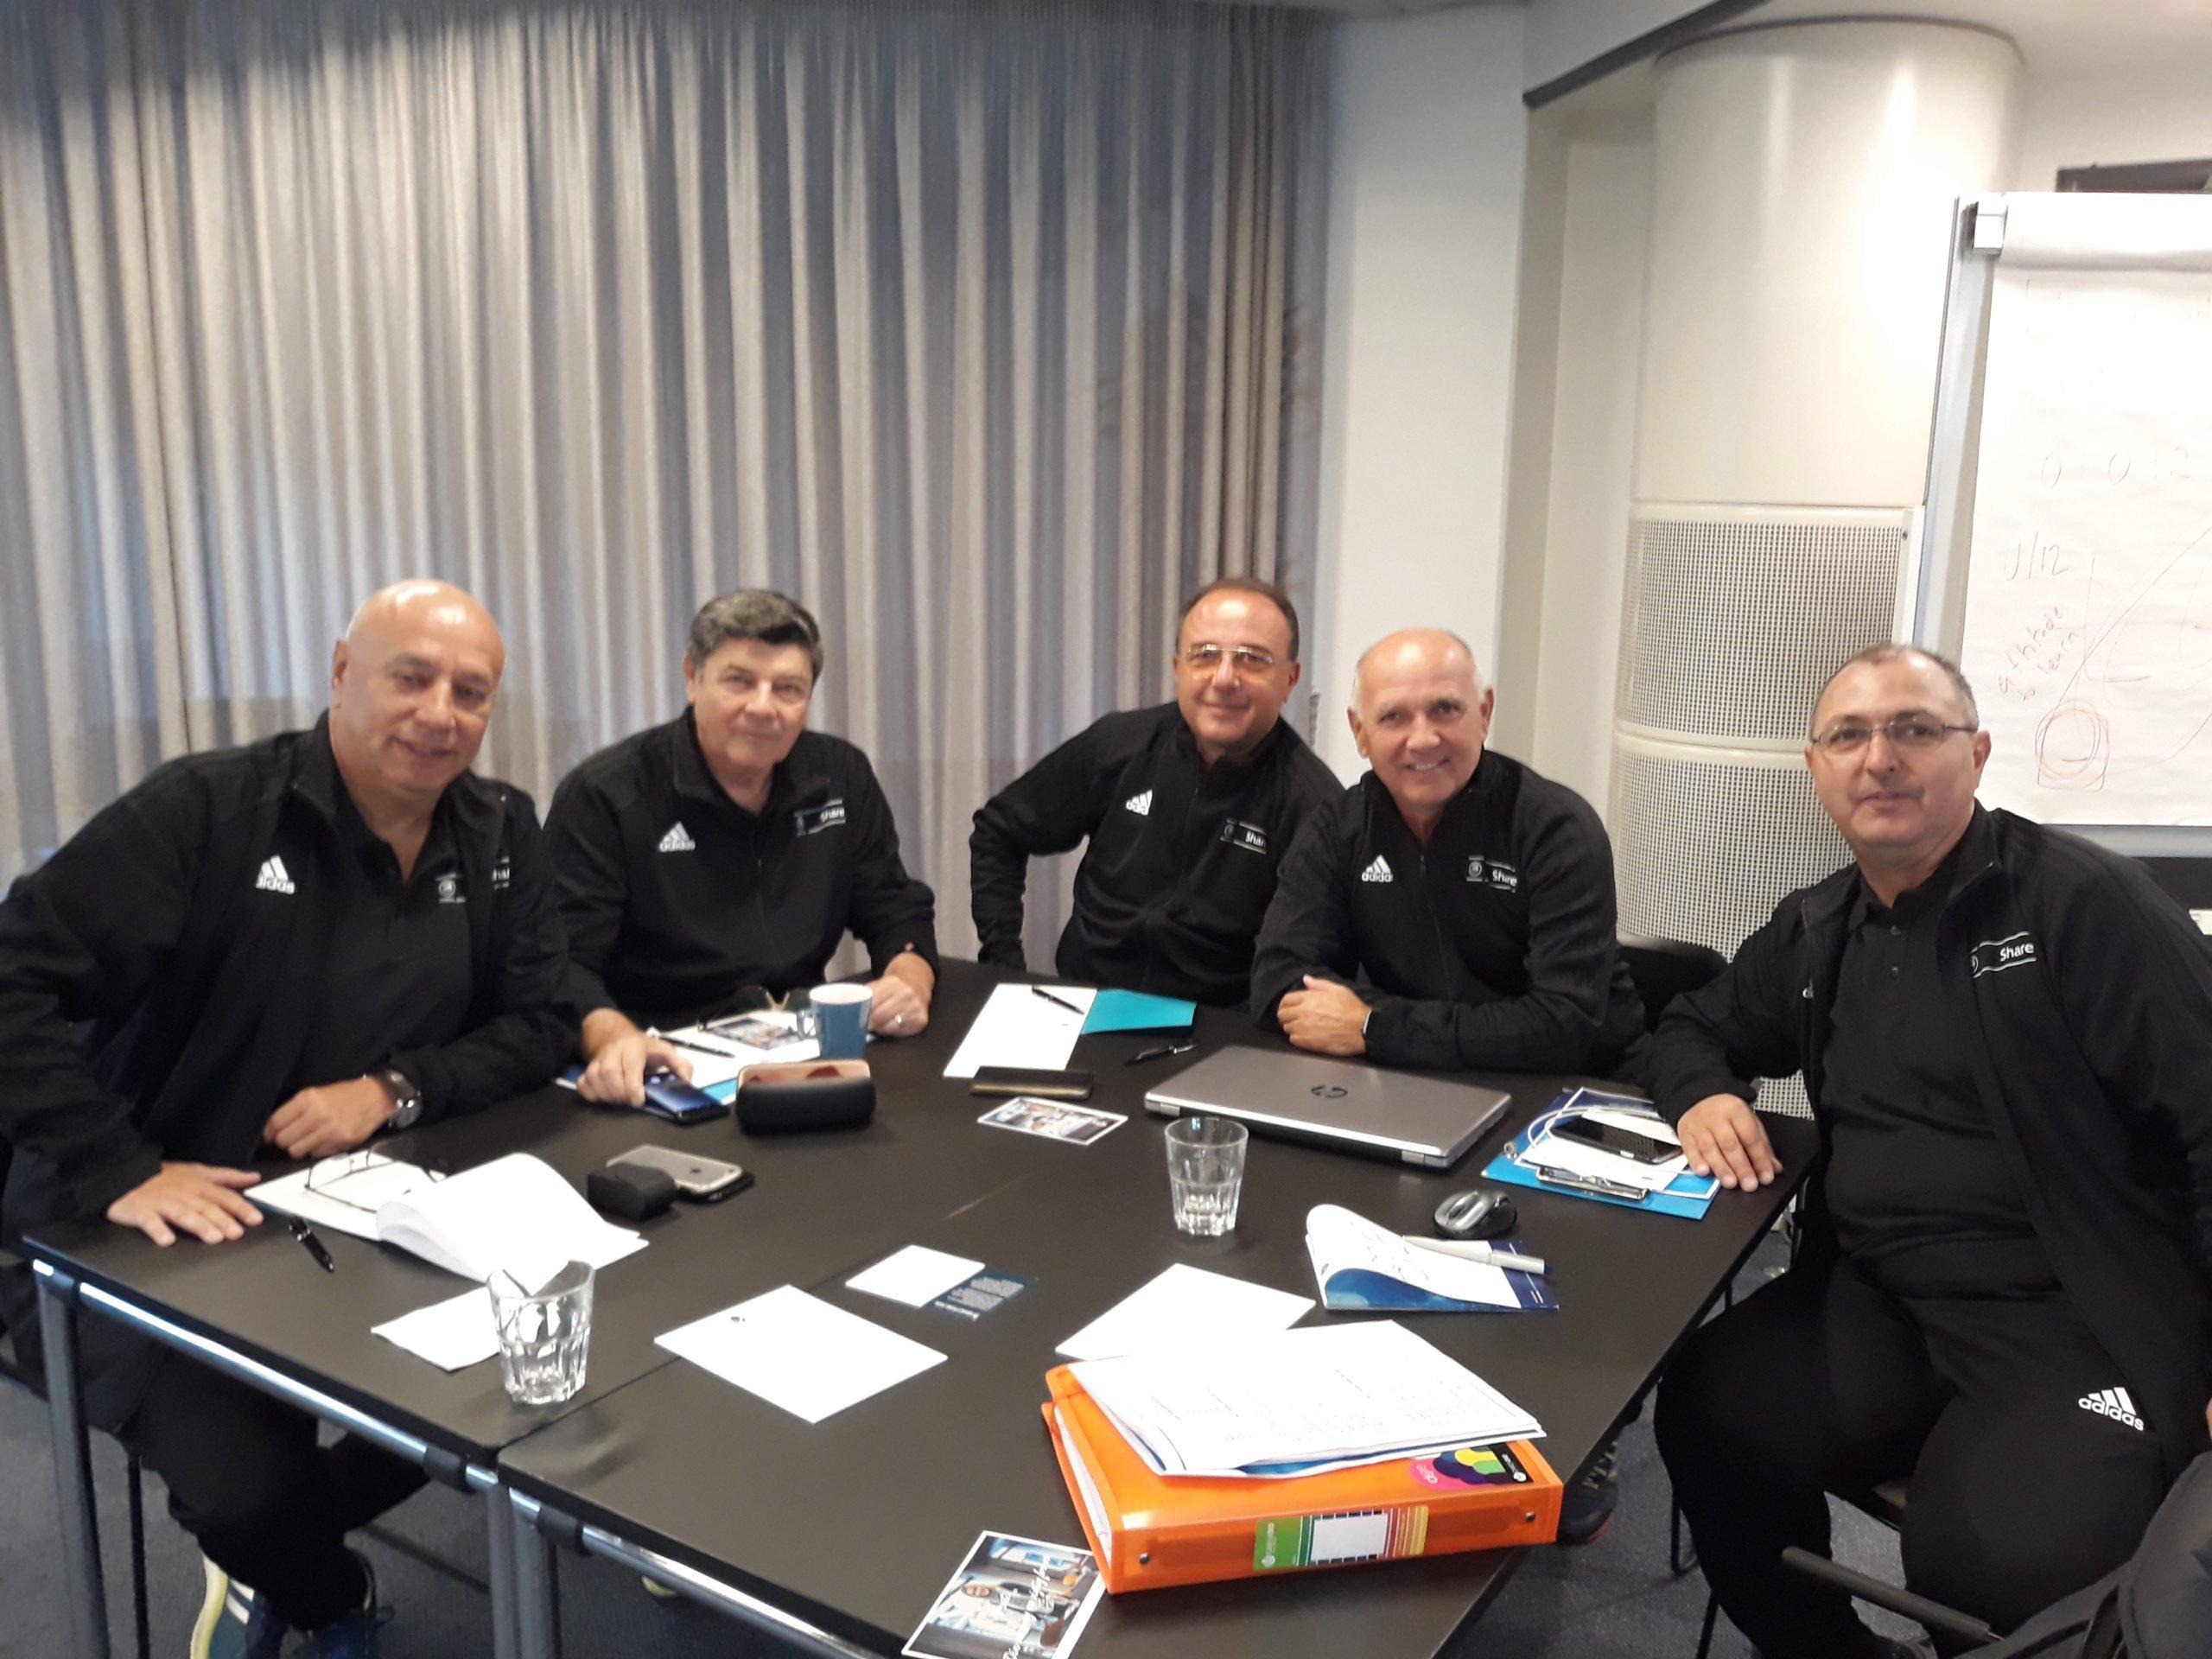 ANTRENAMENT BRONDBY FC U17 - DANEMARCA - Coaches Ahead